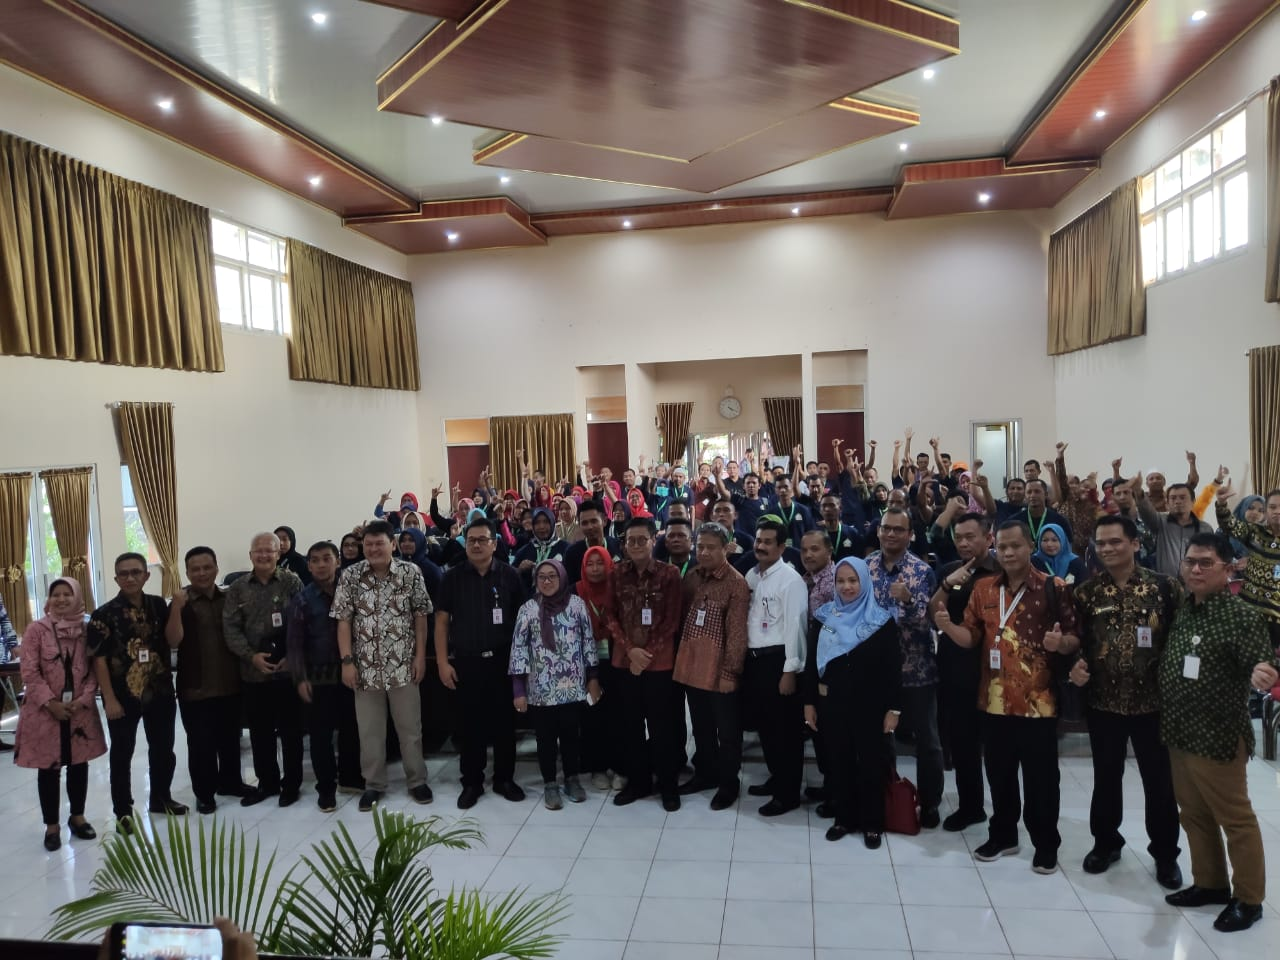 Kepala BPPSDMP Hadiri Kunjungan Pers dan Pelatihan Kakao di Lampung, Ini Harapannya